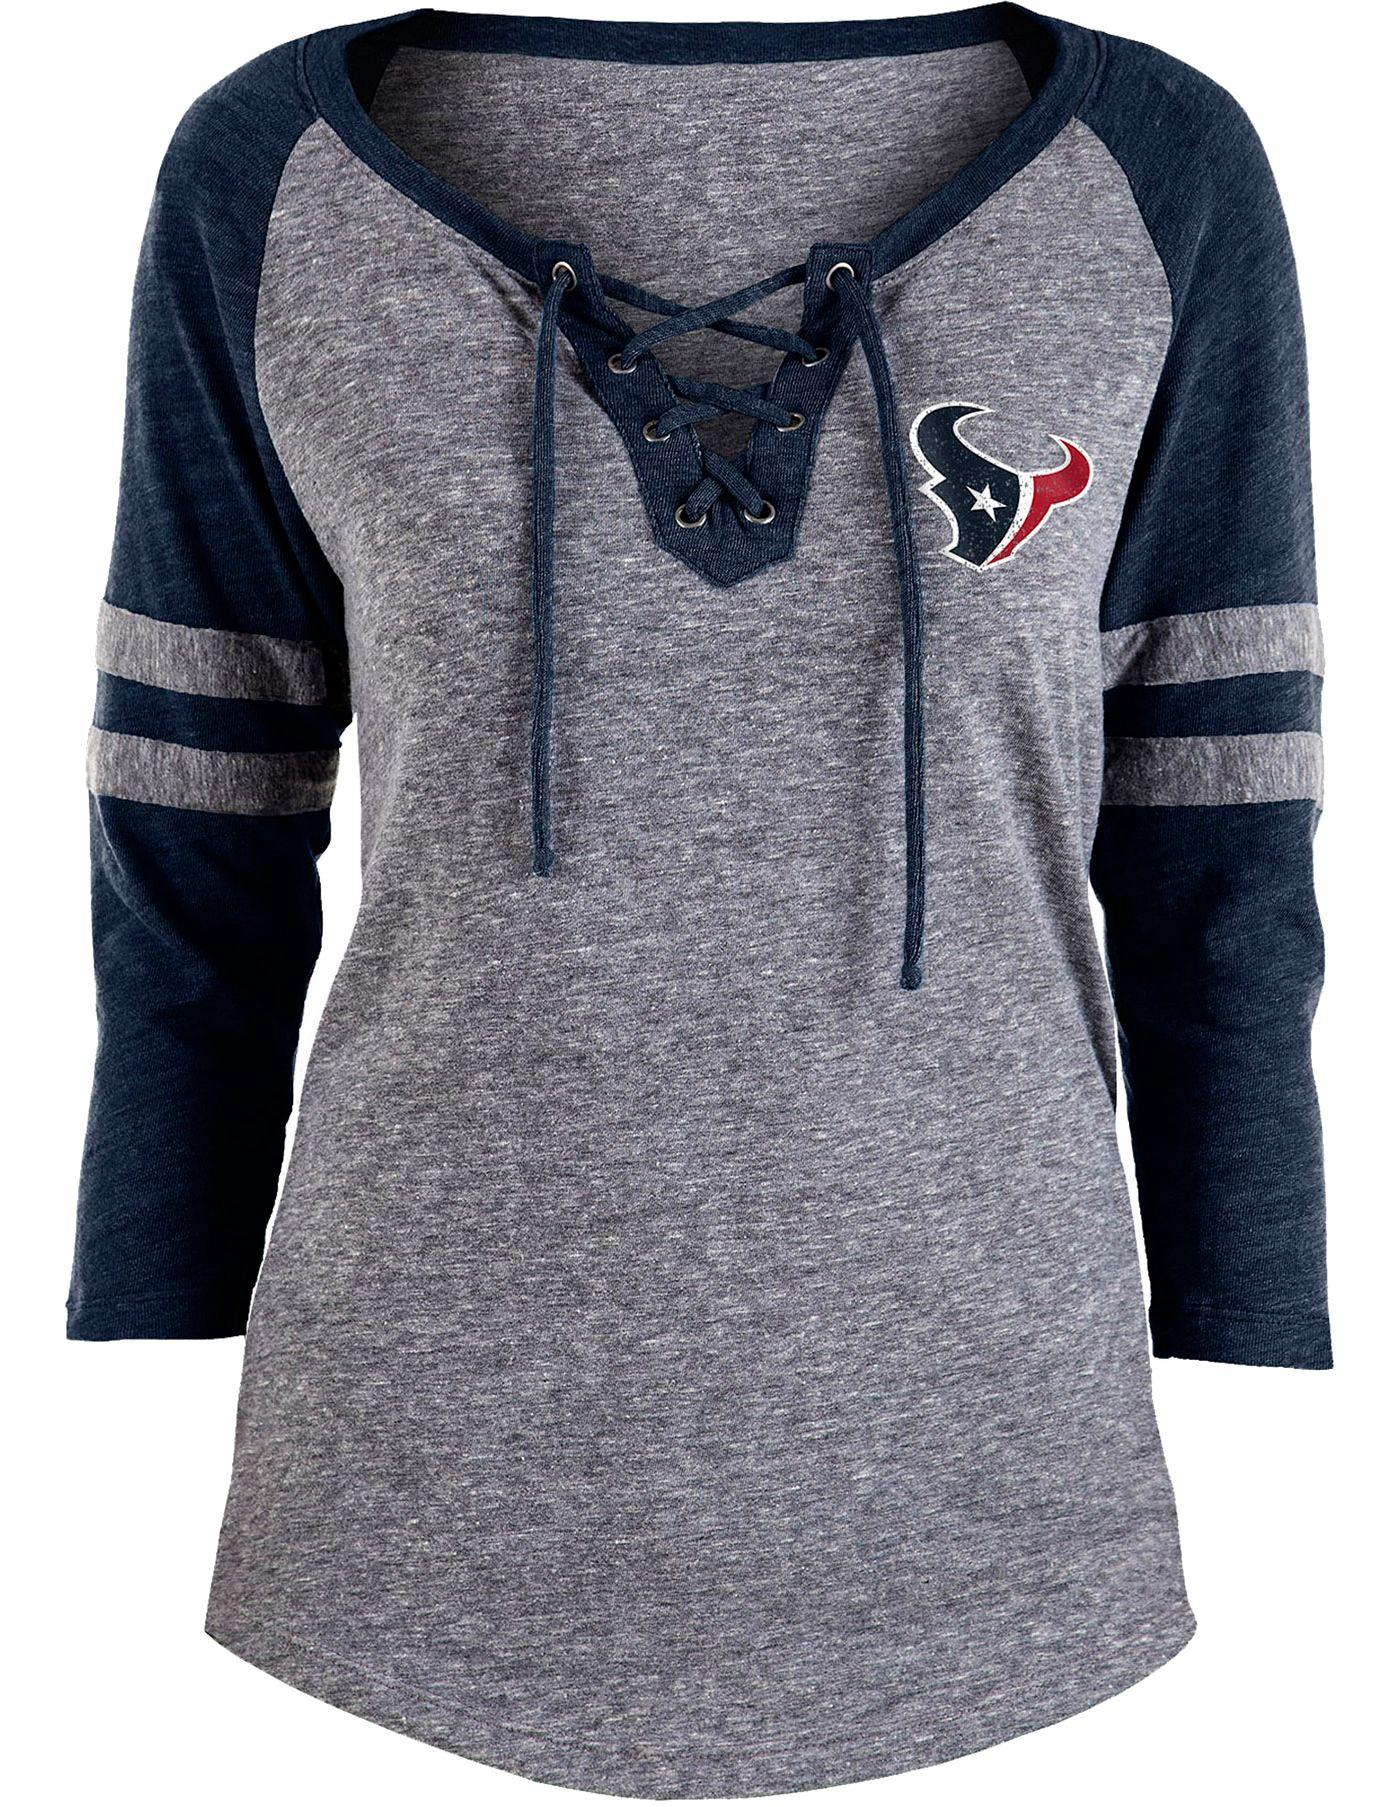 NFL Team Apparel Women's Houston Texans Trilace Grey Raglan Shirt